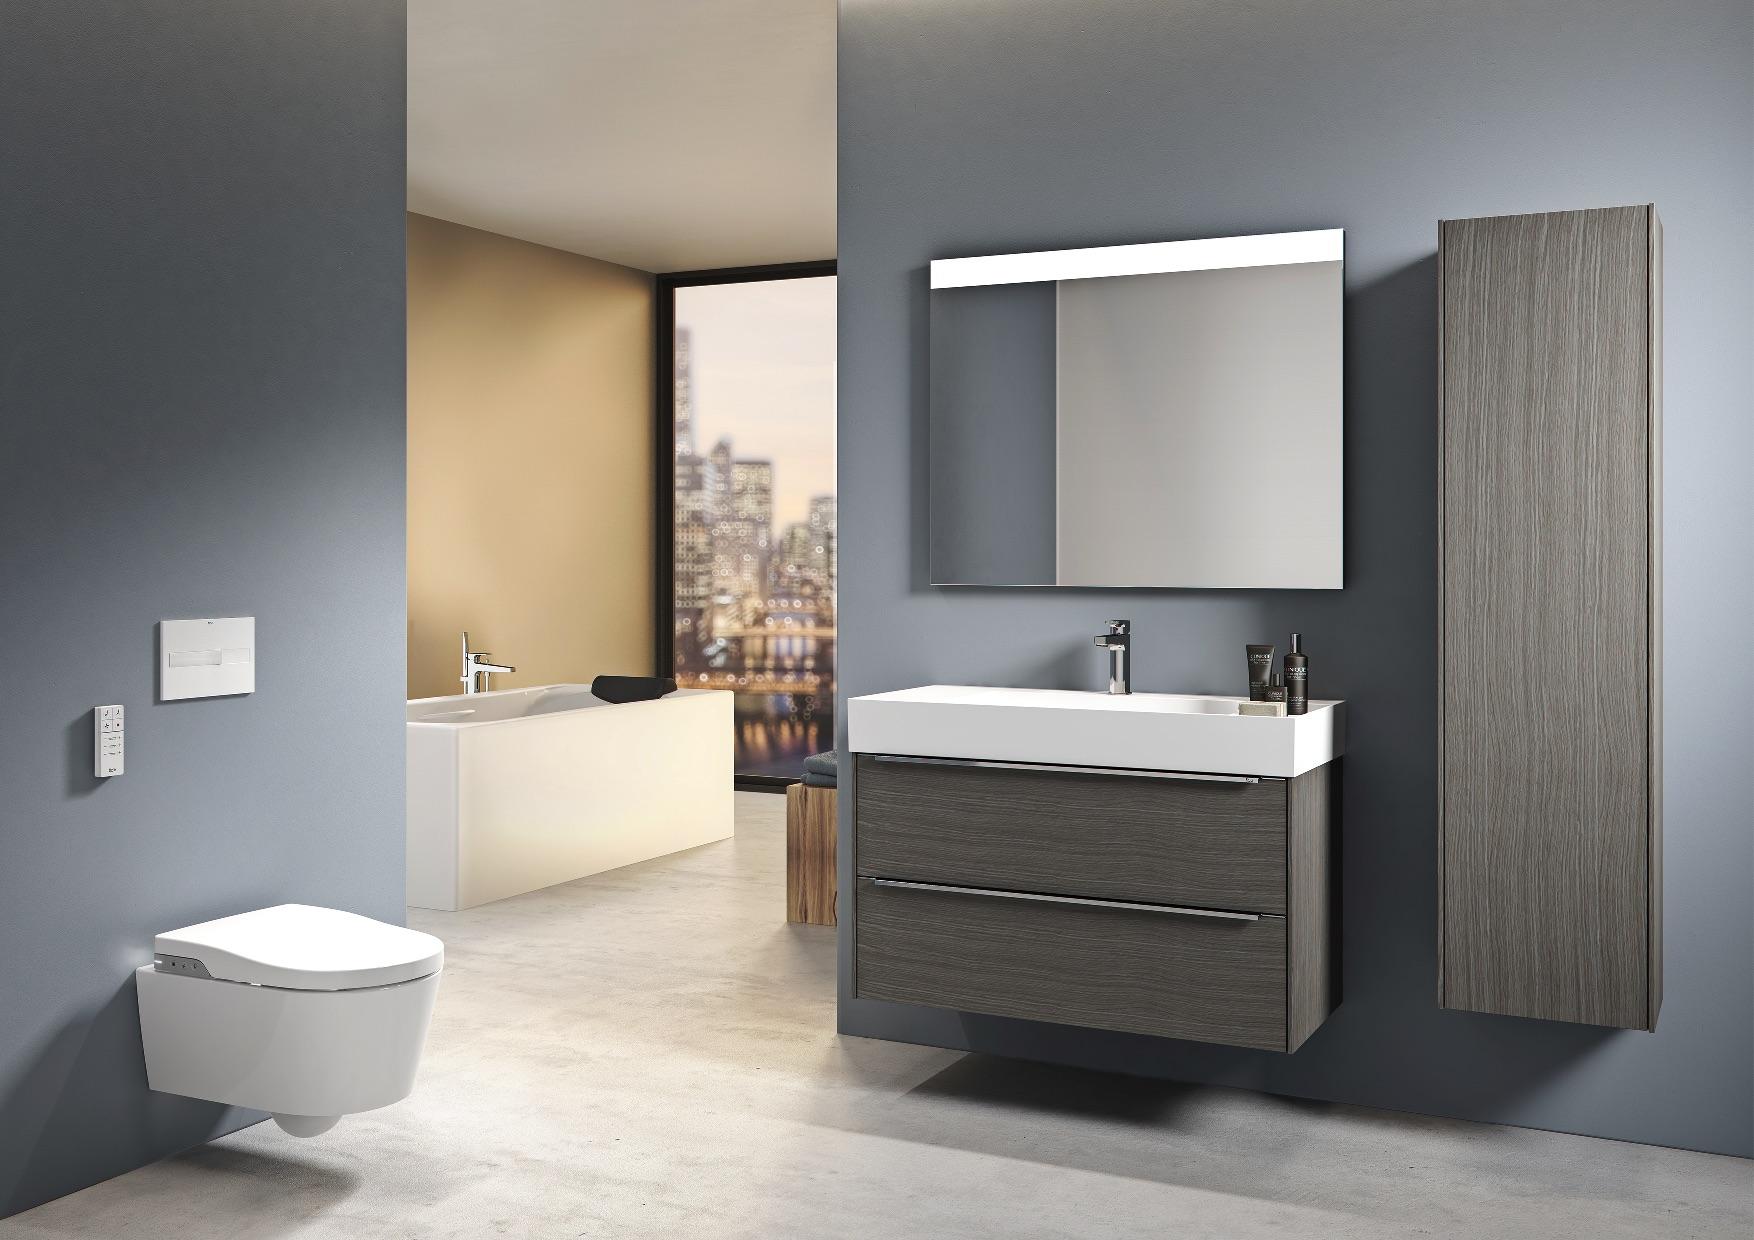 In Wash Inspira Luxusni Toaleta A Bidet V Jednom Design Home Garden